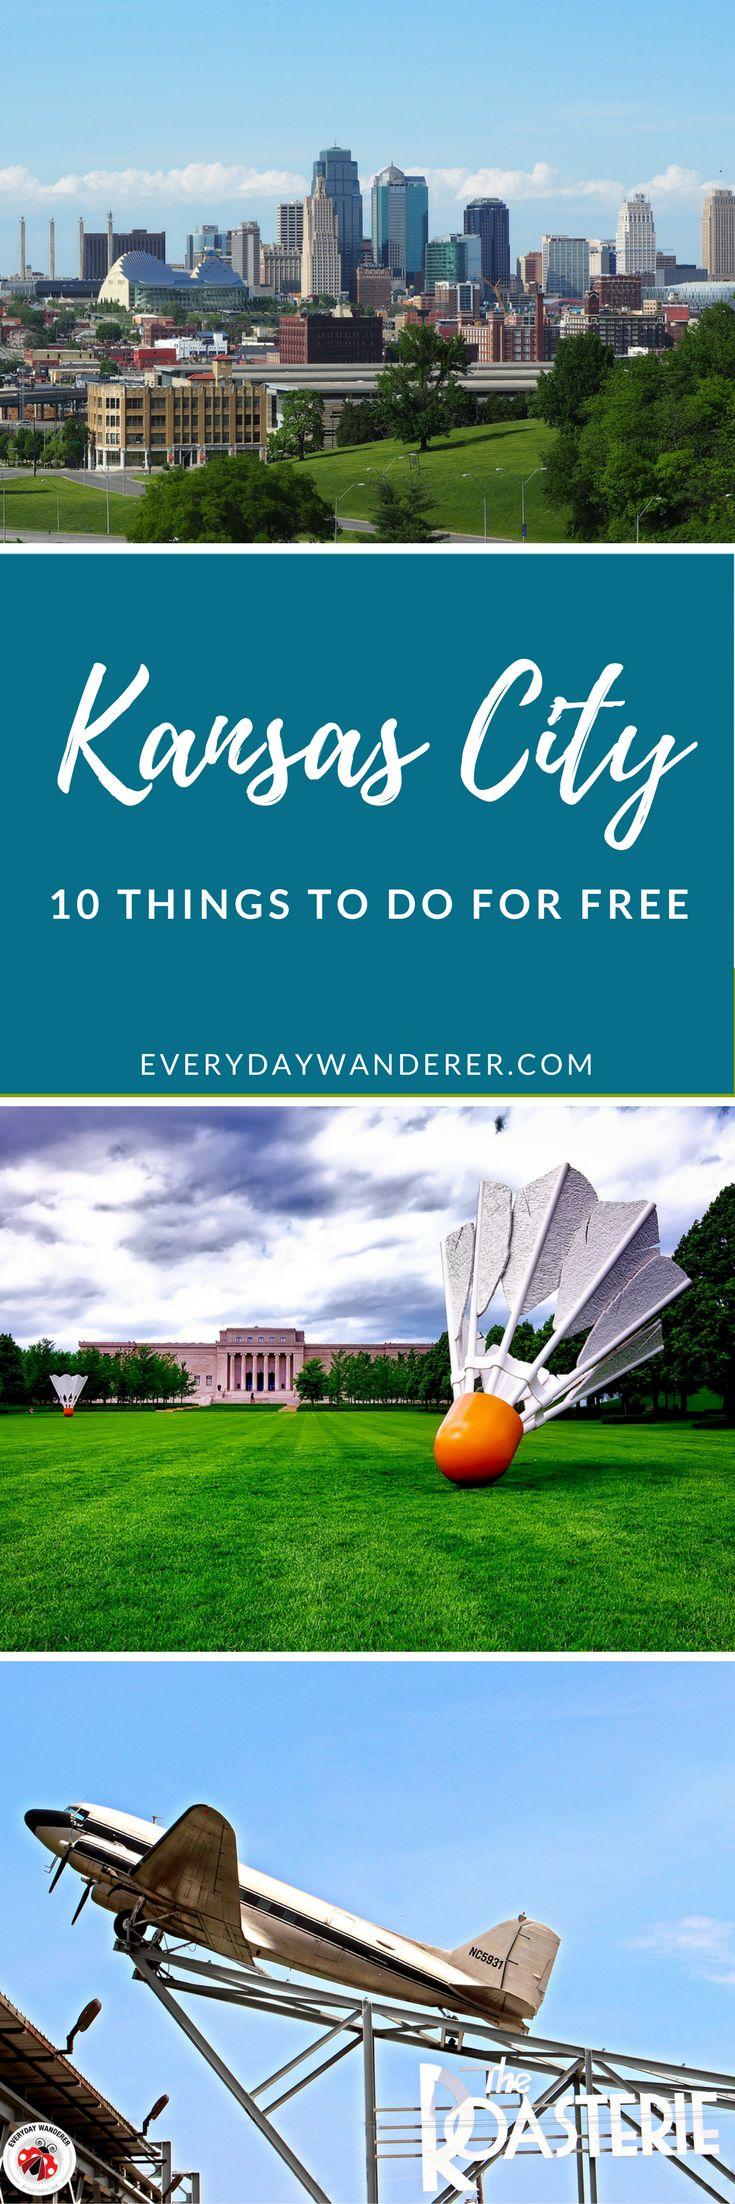 10 things to do and see for FREE in Kansas City #travel #kansascity #kcmo #visitkc #mwtravel #howwedokc #missouri #kansas